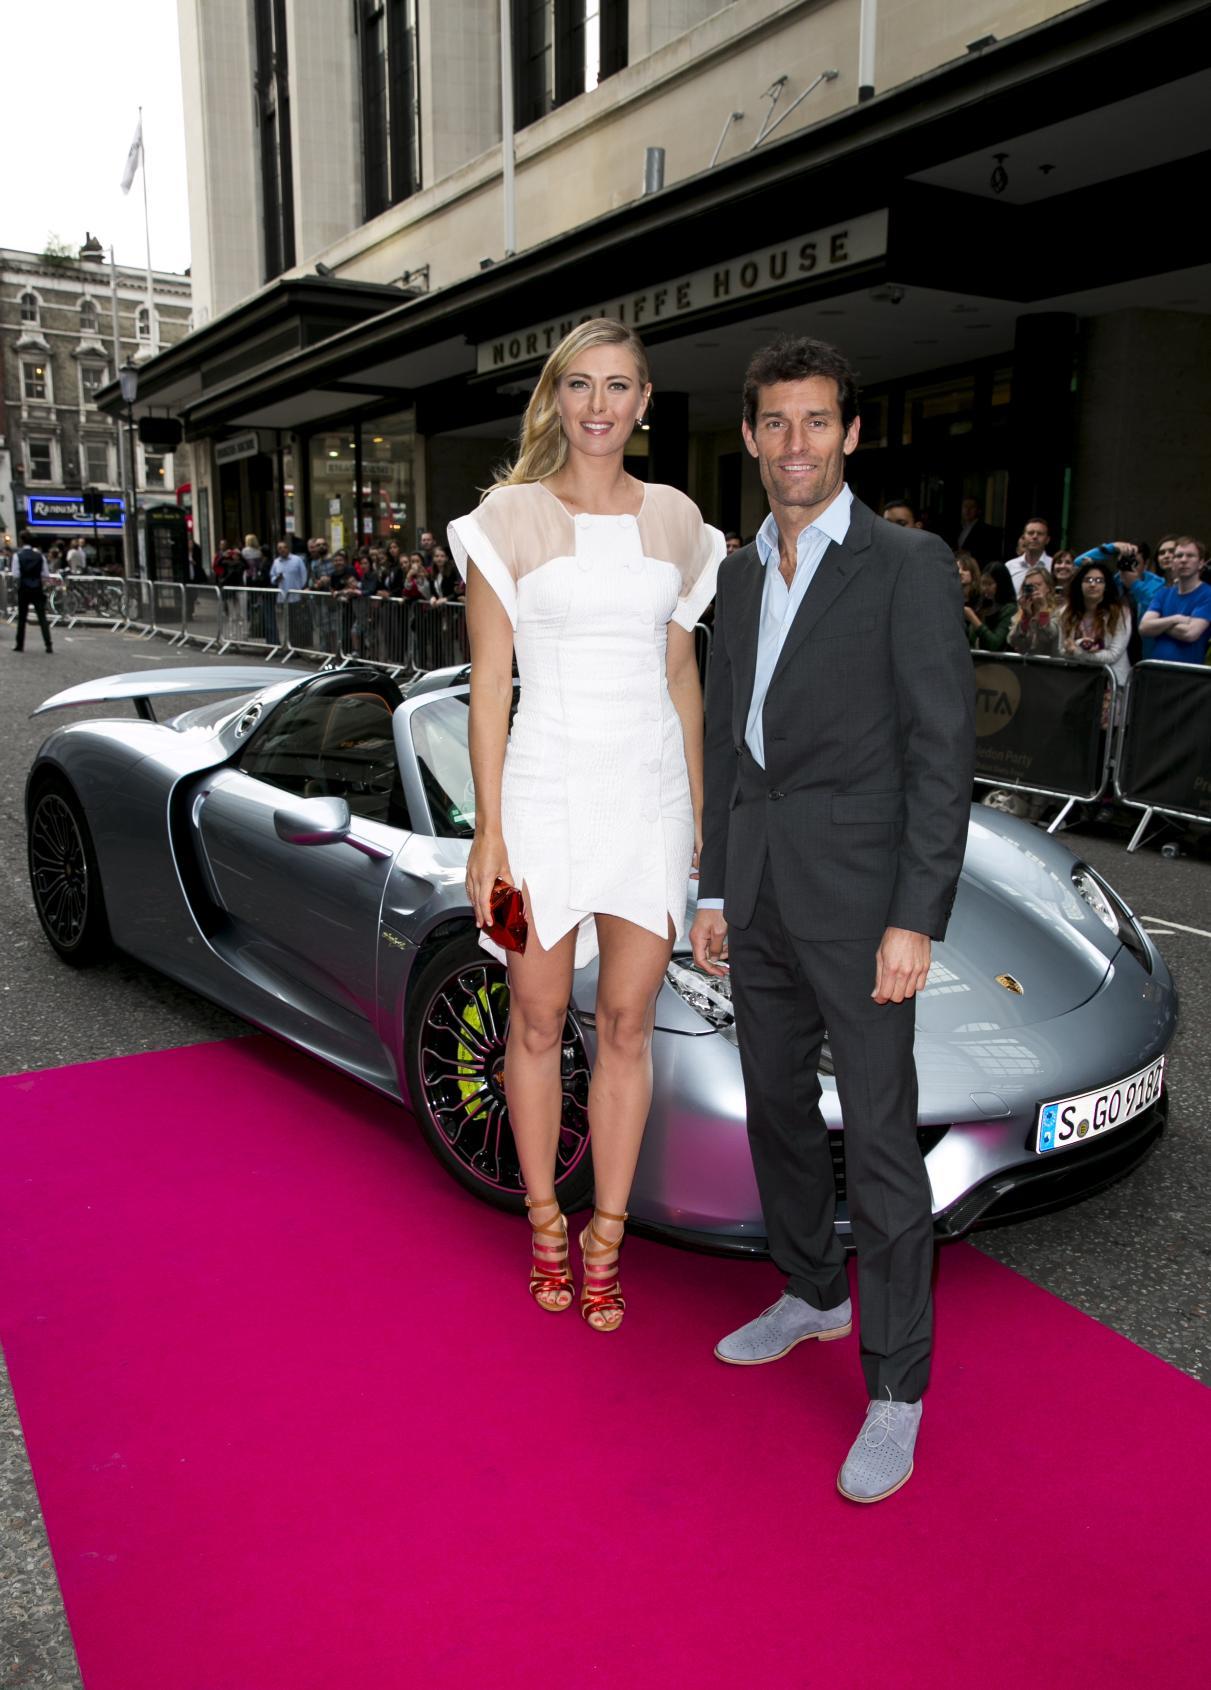 Maria_Sharapova_and_Mark_Webber_arrive_at_the_WTA_at_Kensington_Roof_Gardens_in_the_918_Spyder